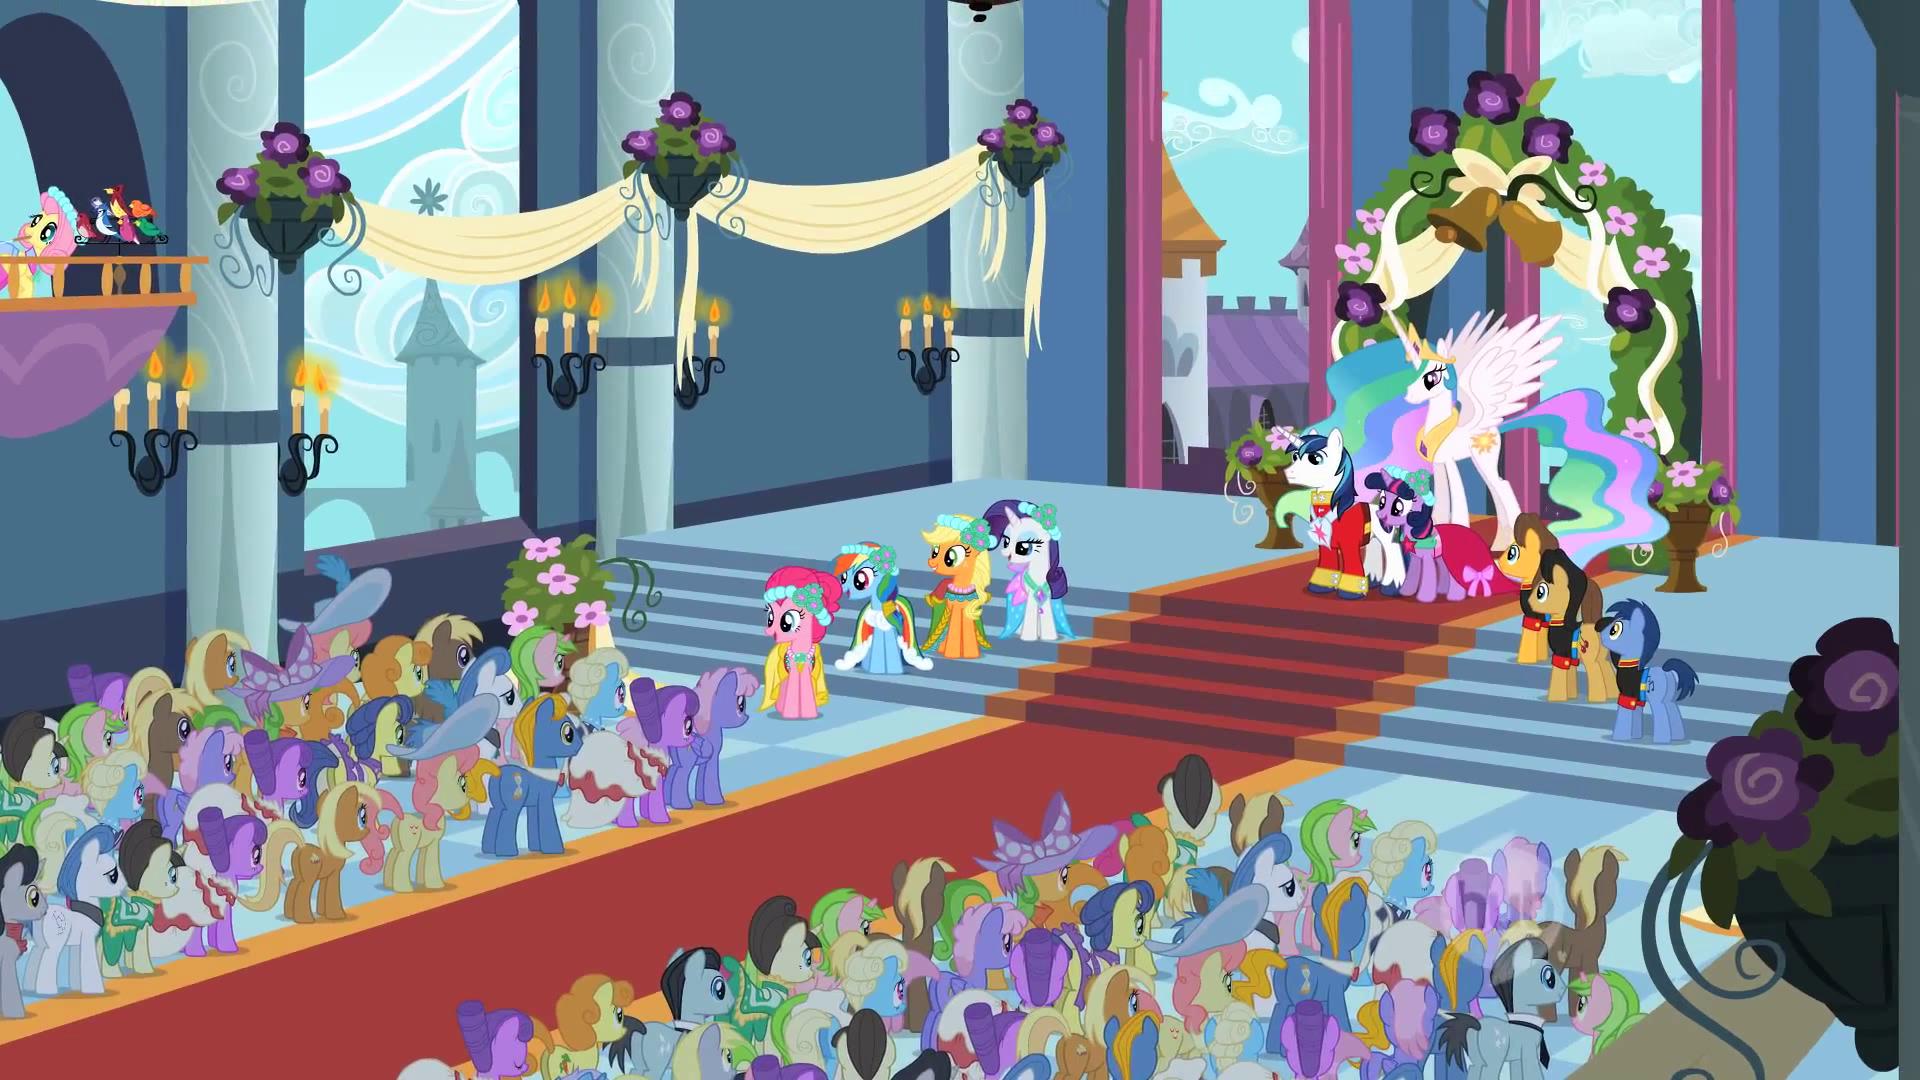 Royal Wedding Crowd S2e26 Png